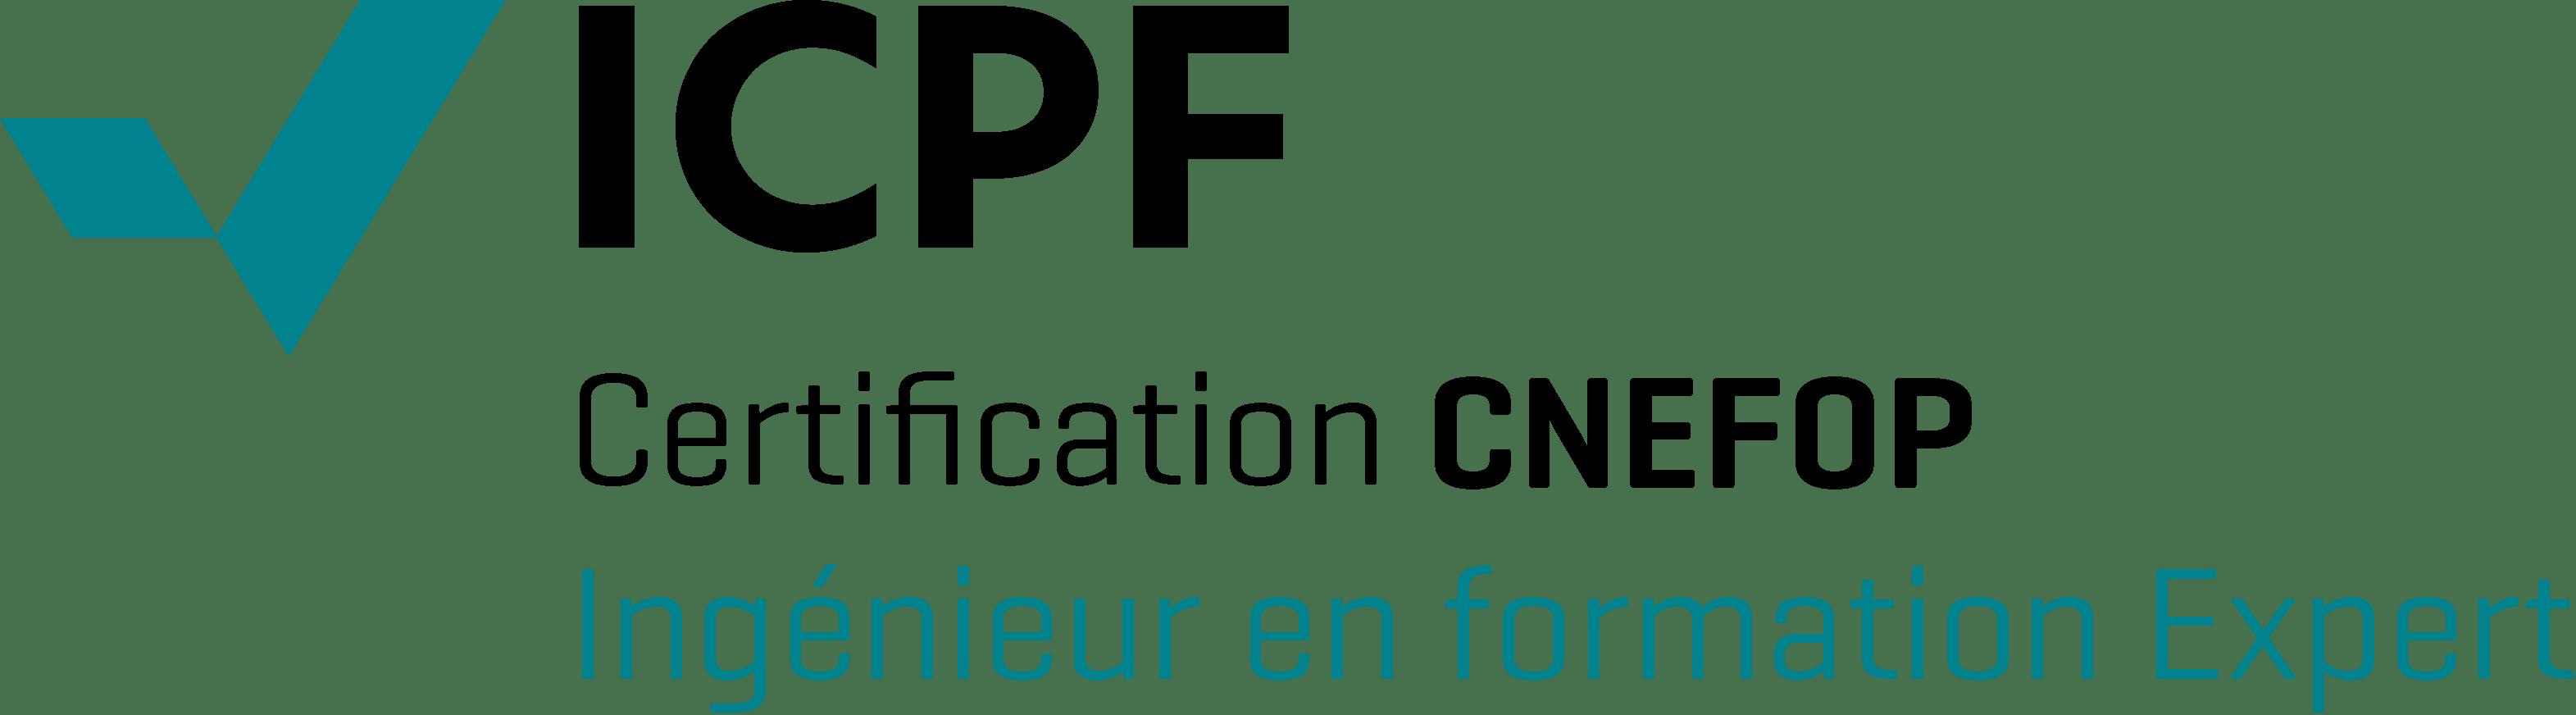 ICPF expert CNEFOP